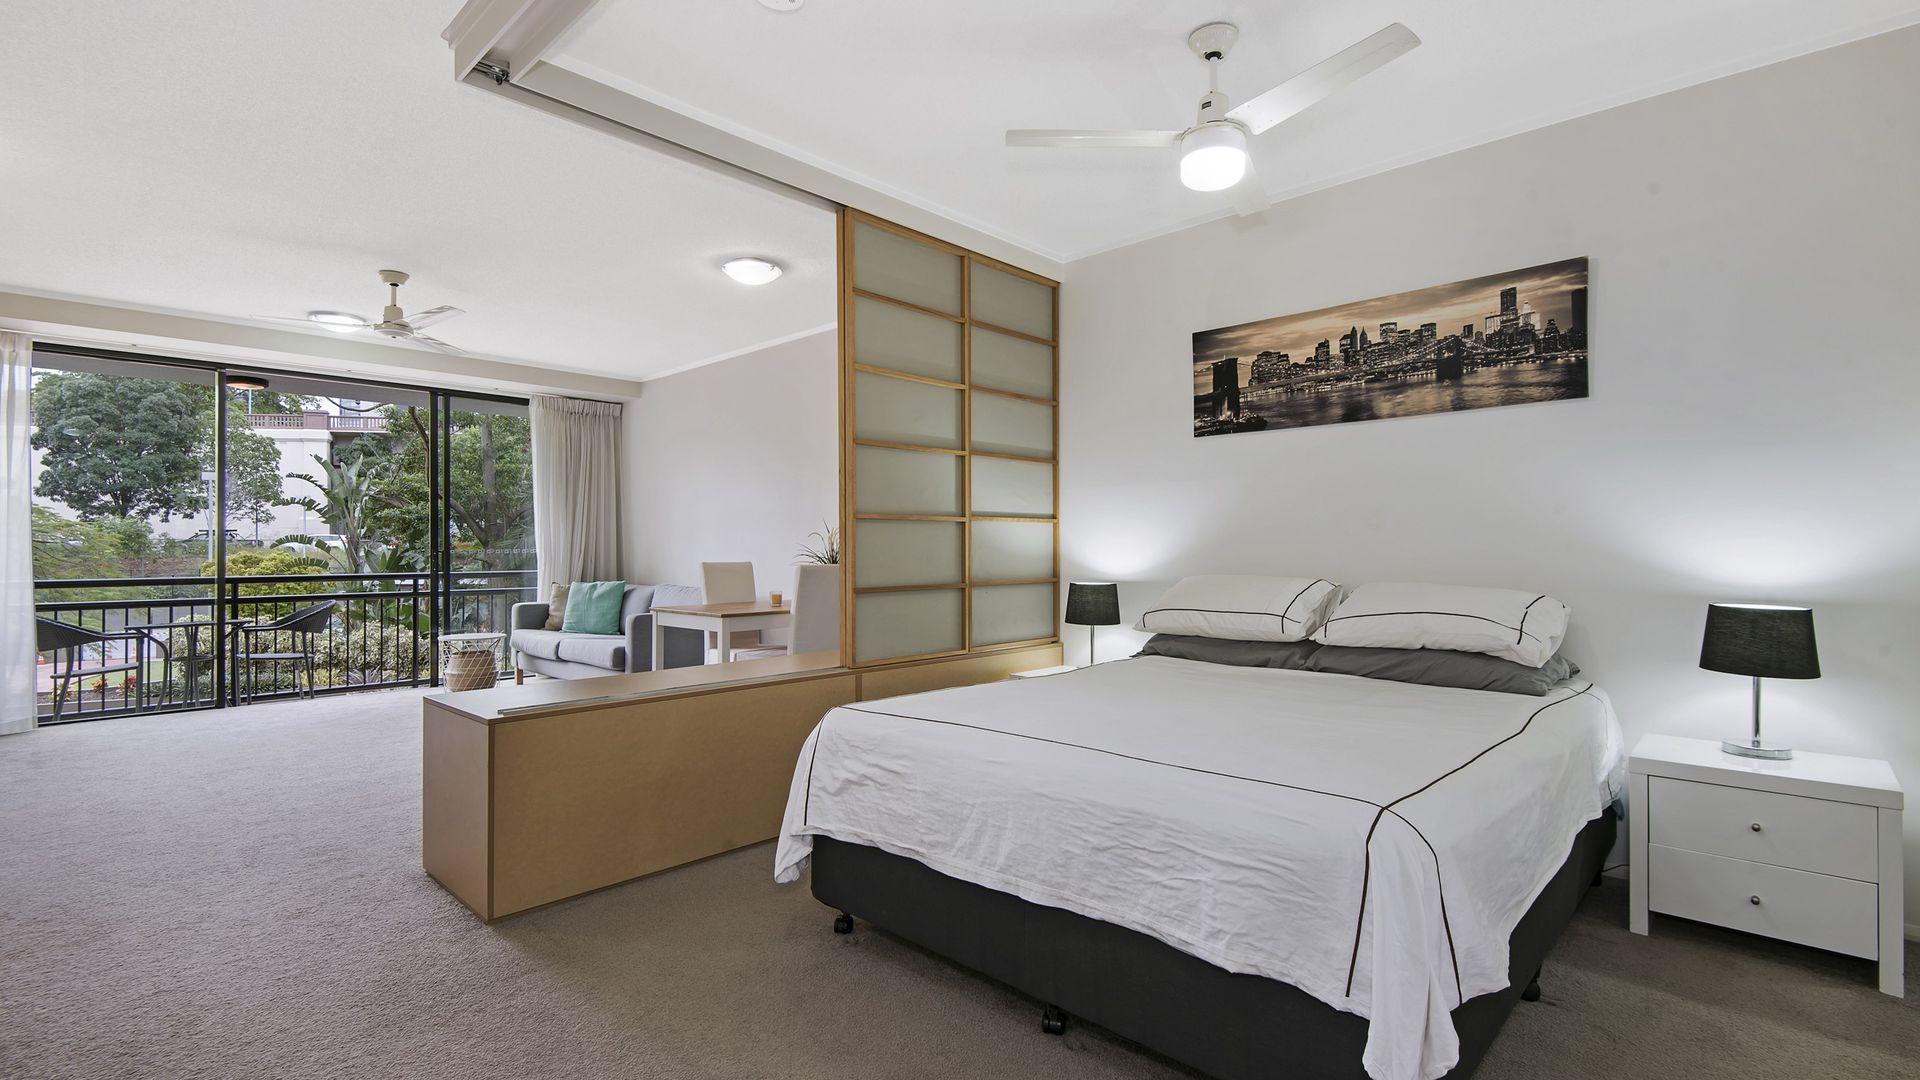 82/15 Goodwin Street, Kangaroo Point QLD 4169, Image 2